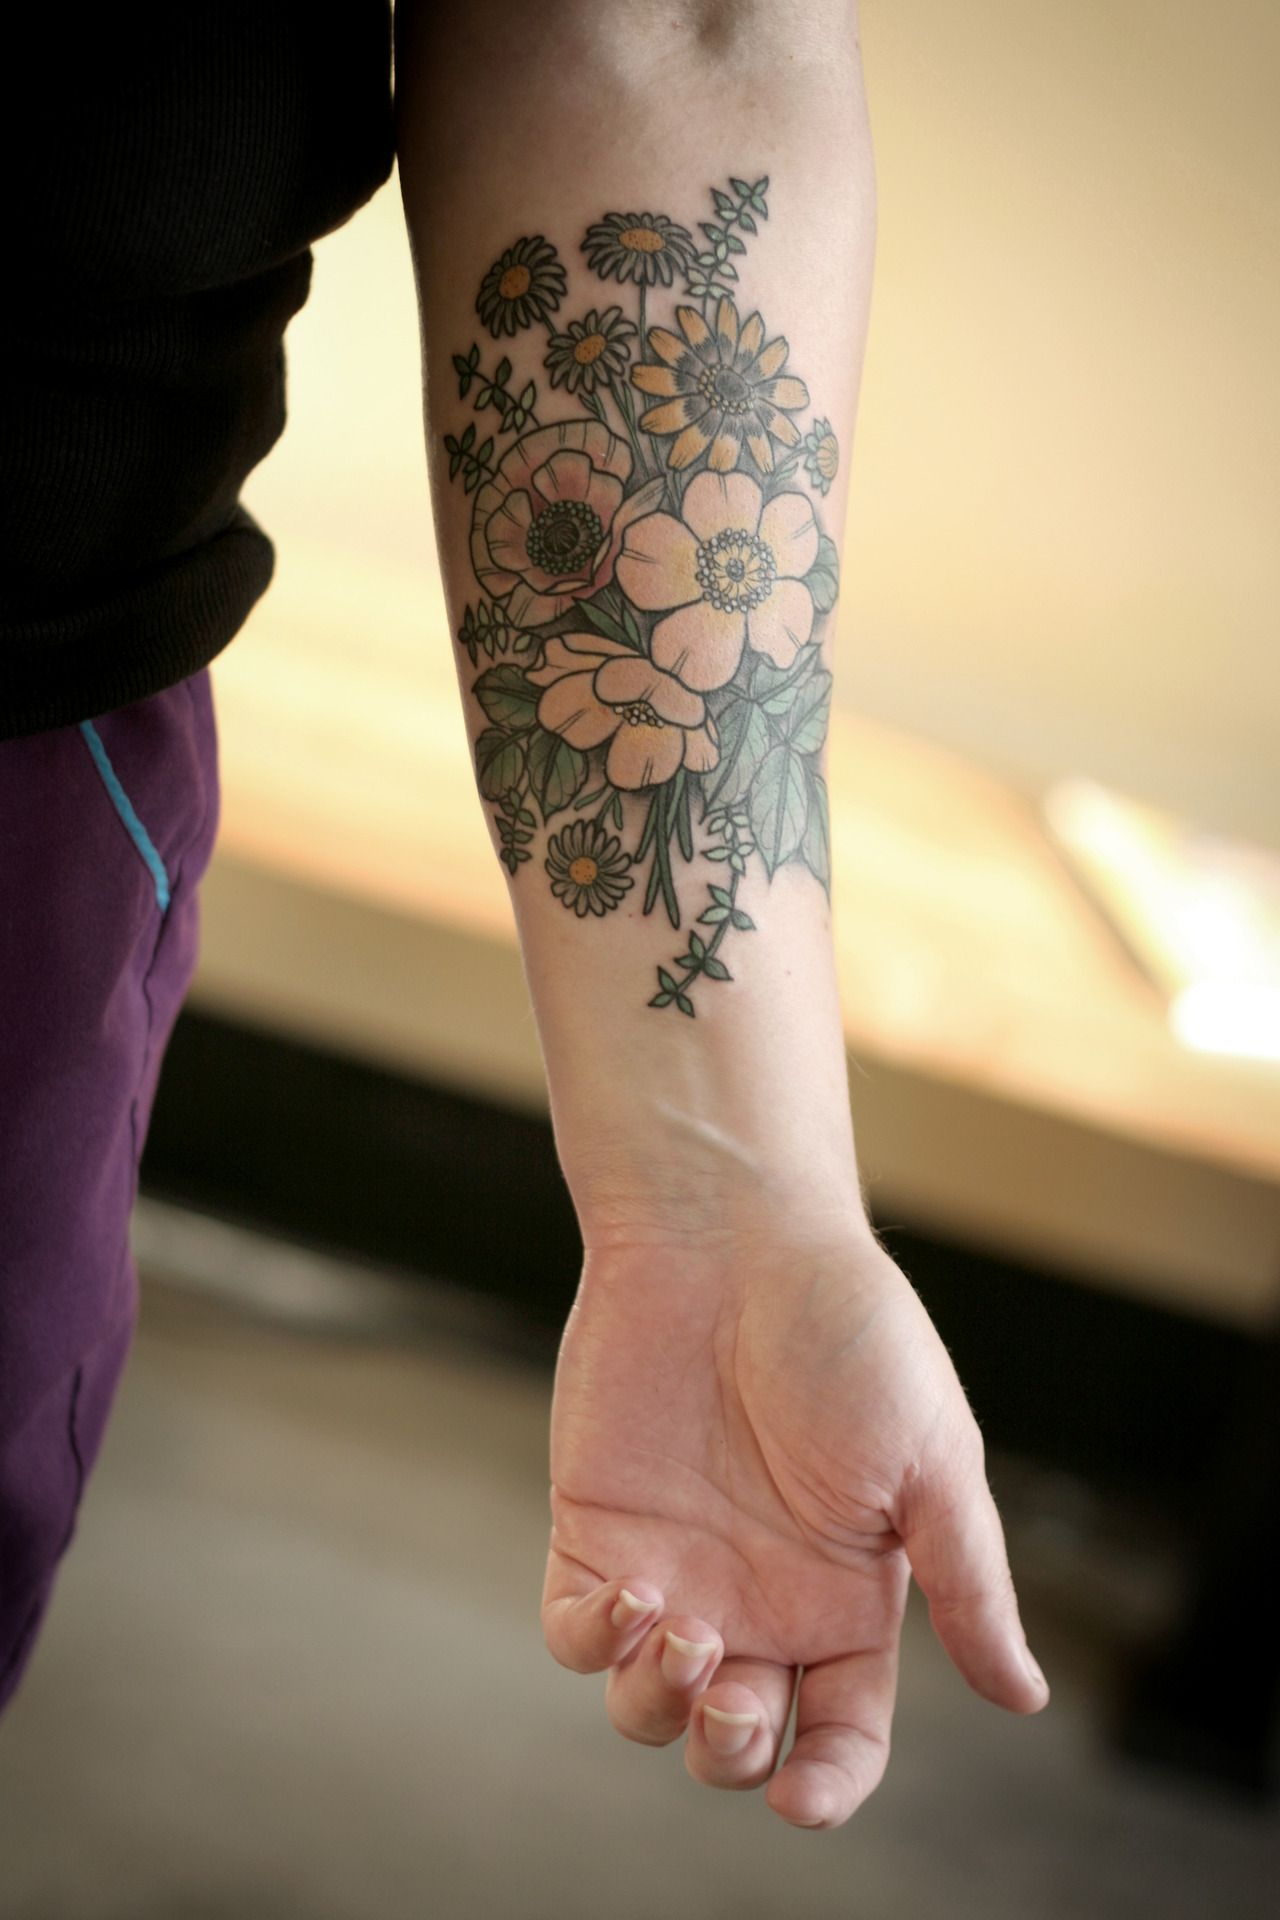 Tattoo Lena Katina caused scandal in America 08/13/2010 89